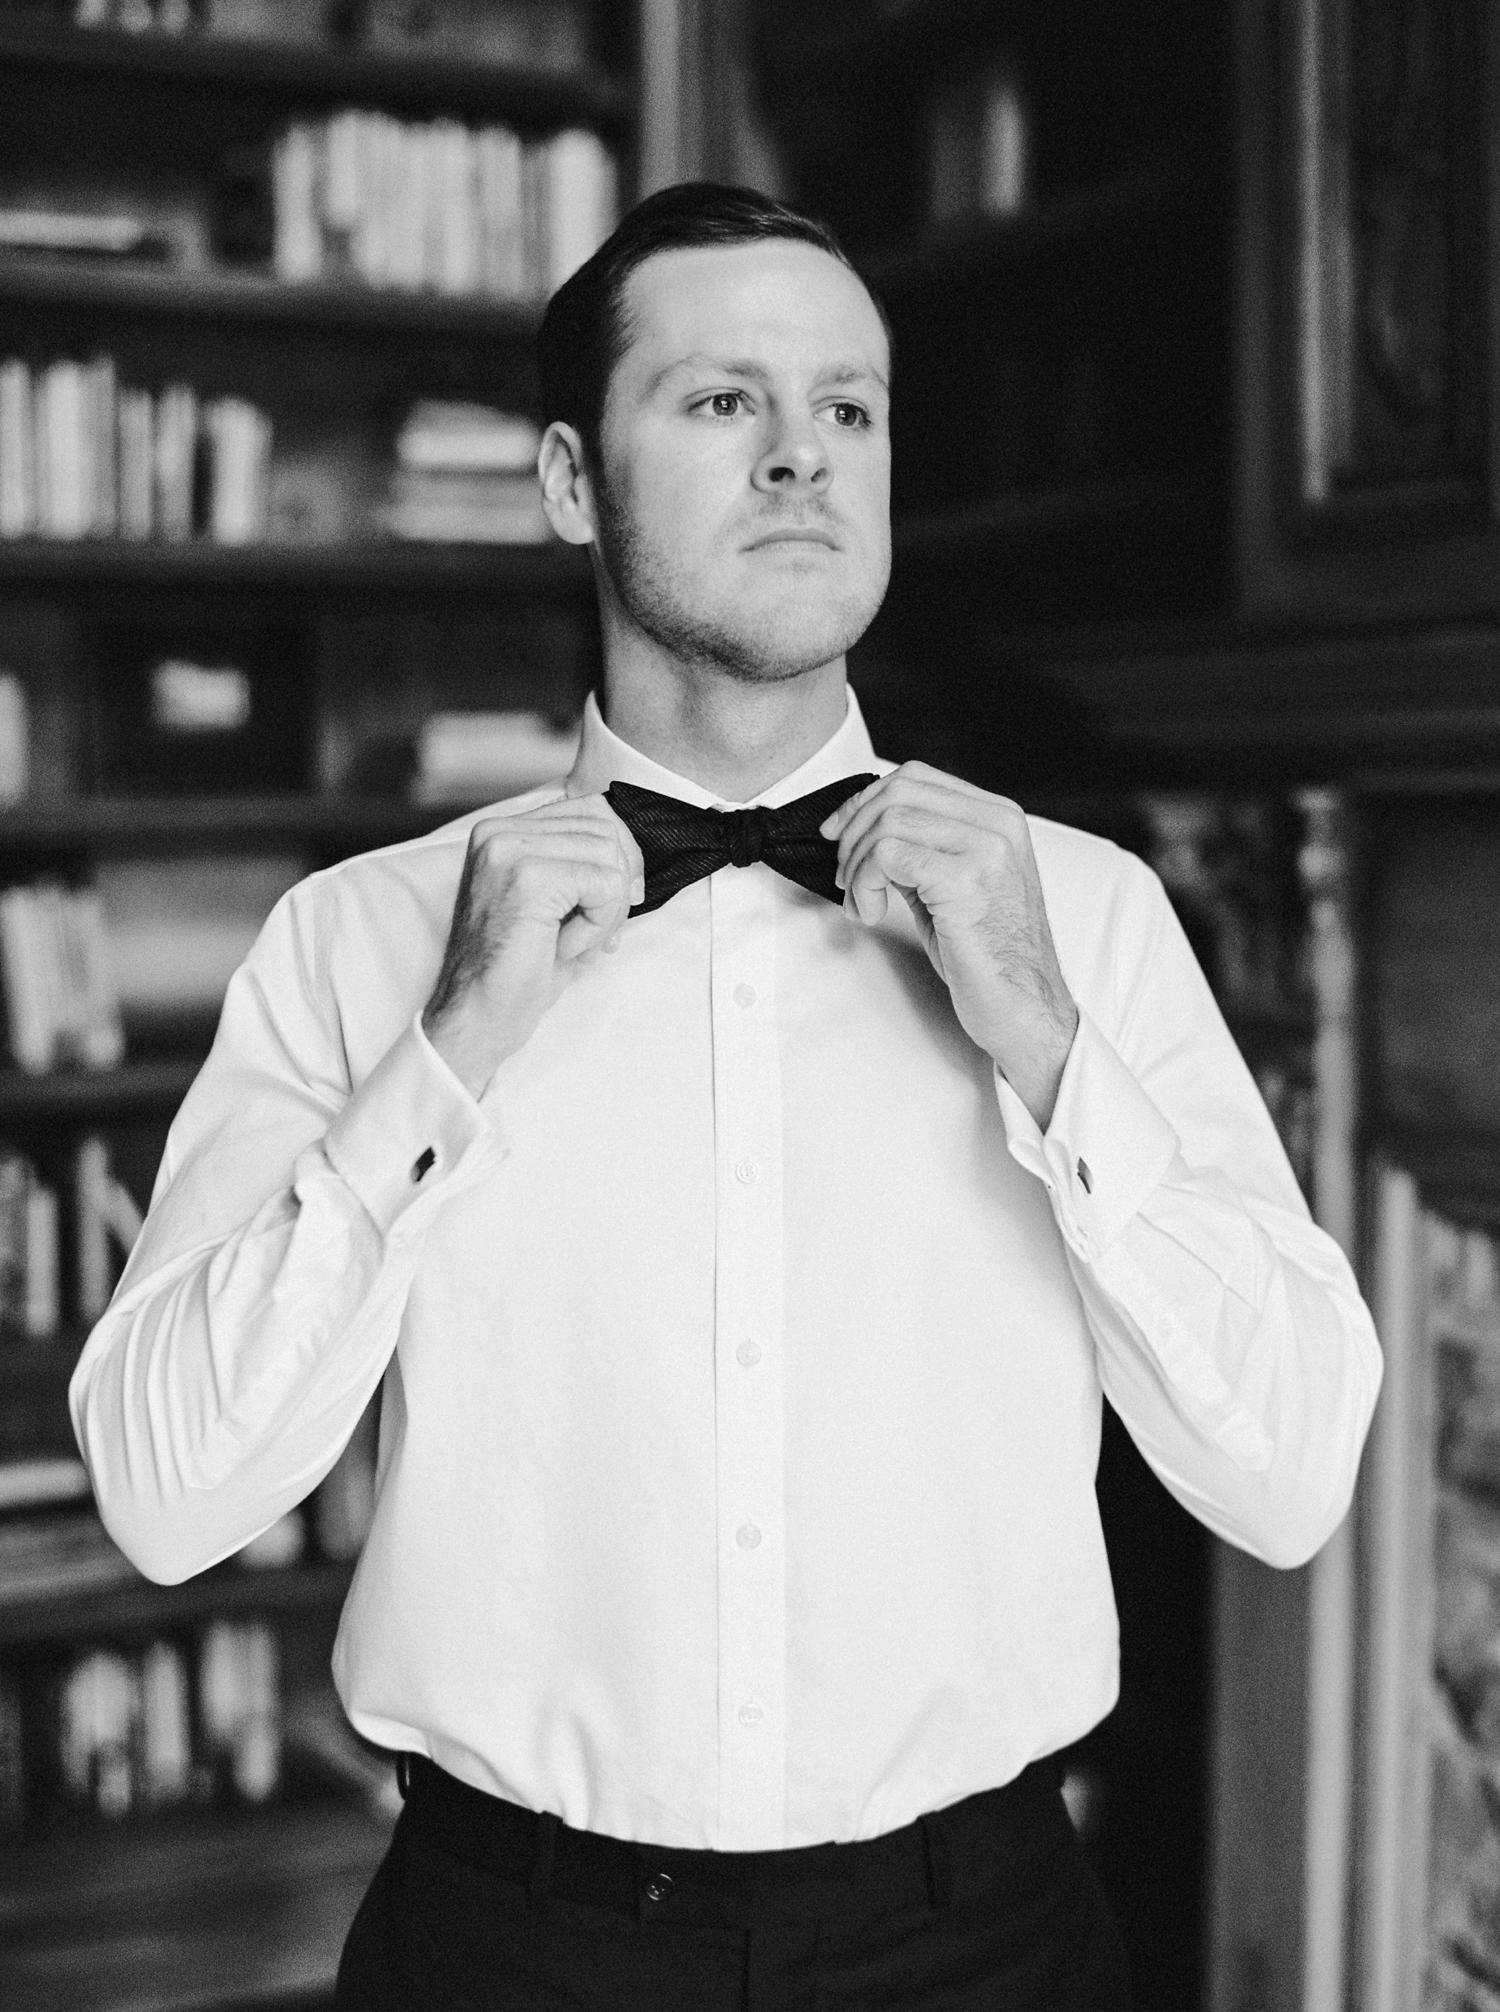 Calgary wedding photographers | georgia wedding photographers | fine art film | Justine Milton Photography | wedding details | georgia wedding | groom getting ready | bowtie